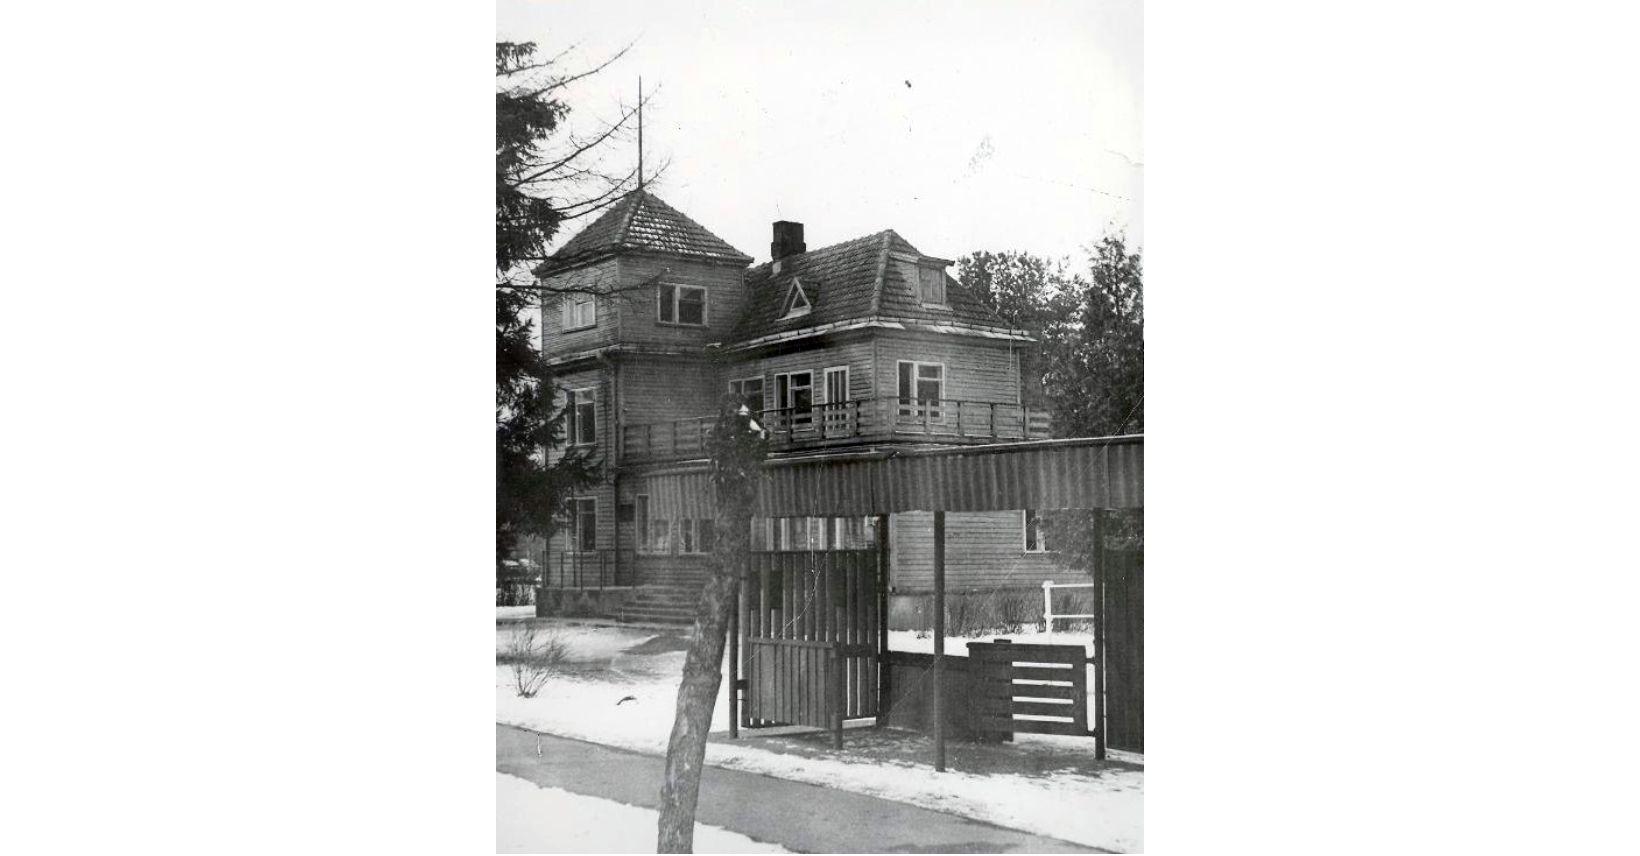 vaiciuskos vila mokykla